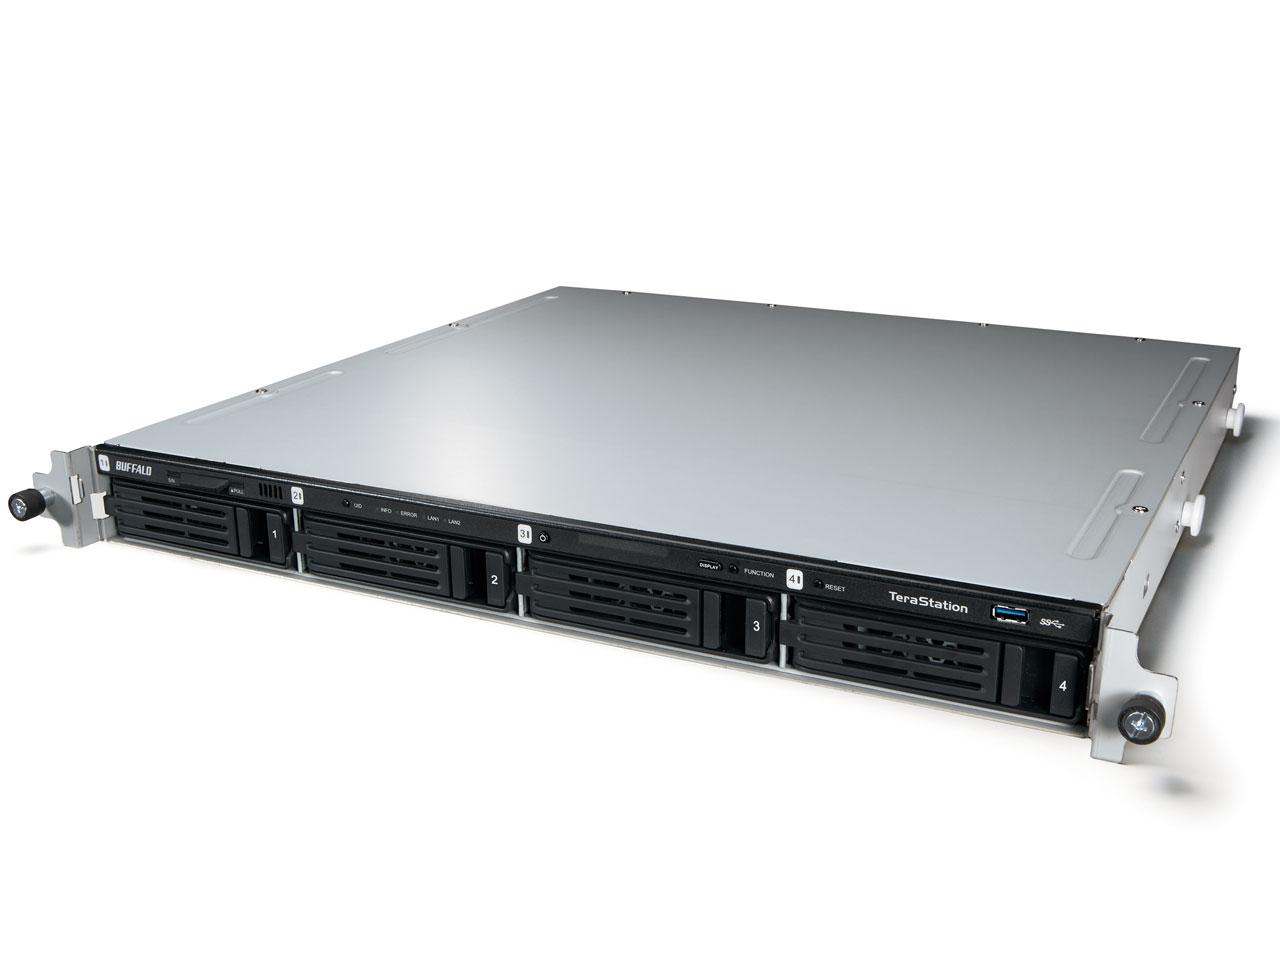 BUFFALO テラステーション NAS 8TB WS5400R0804SR2:Bサプライズ